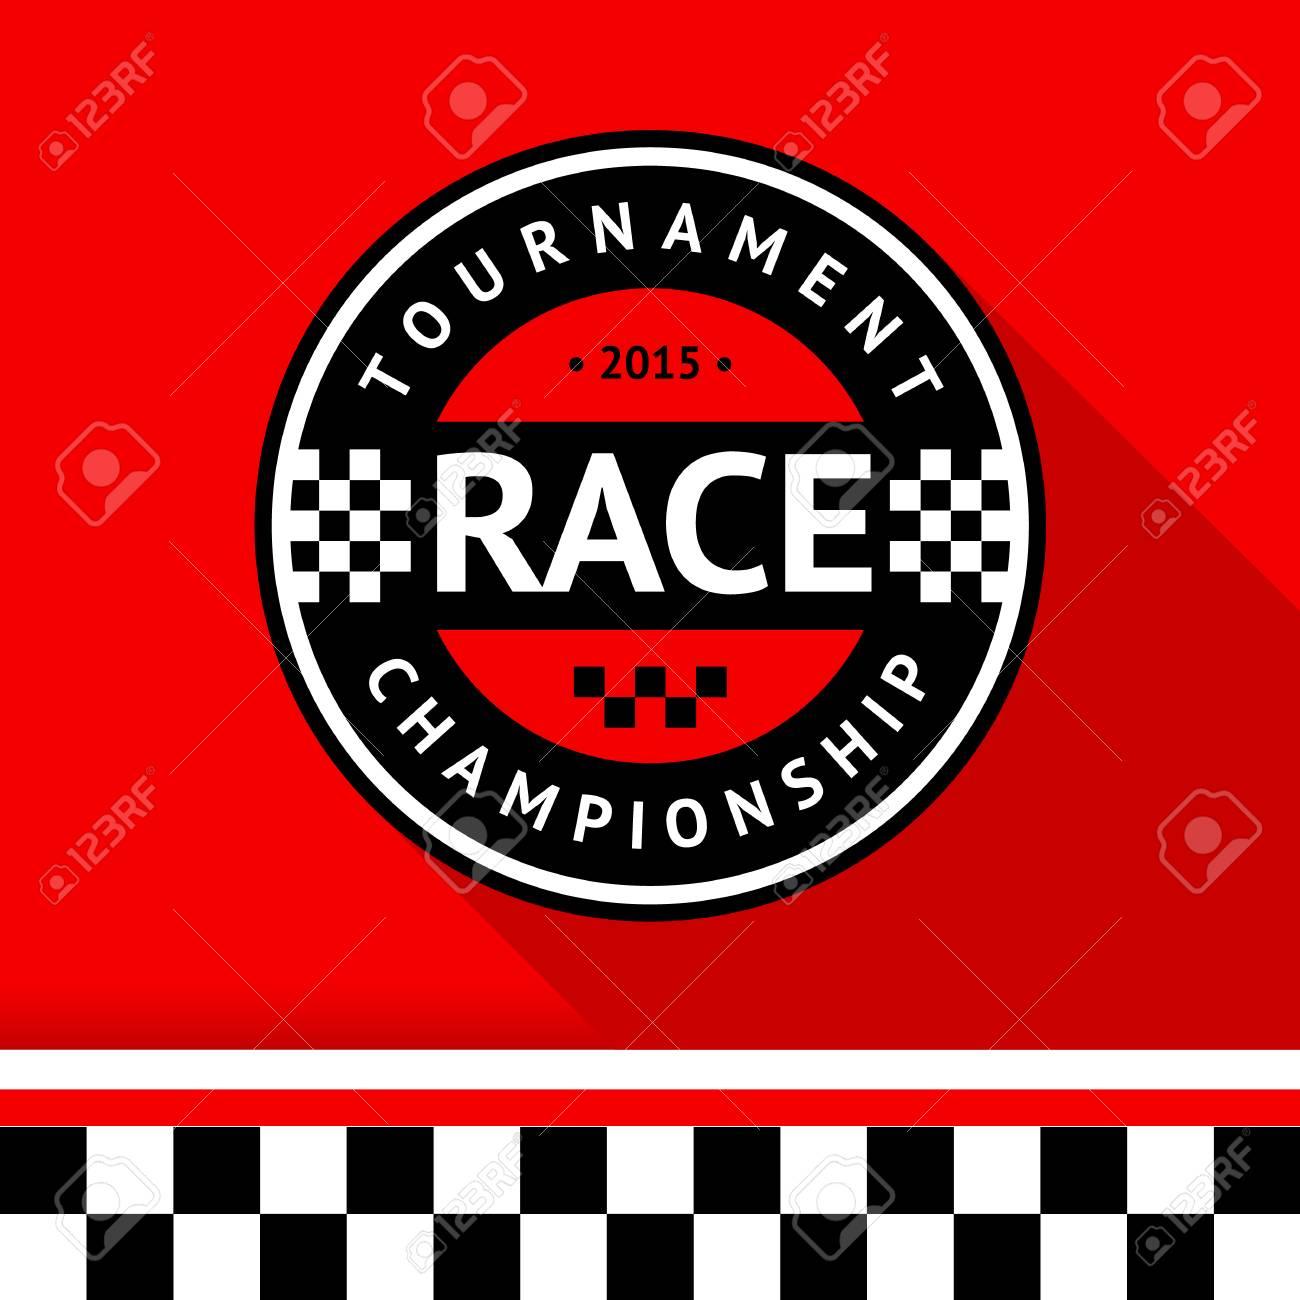 Racing badge 14 illustration Stock Vector - 26705203